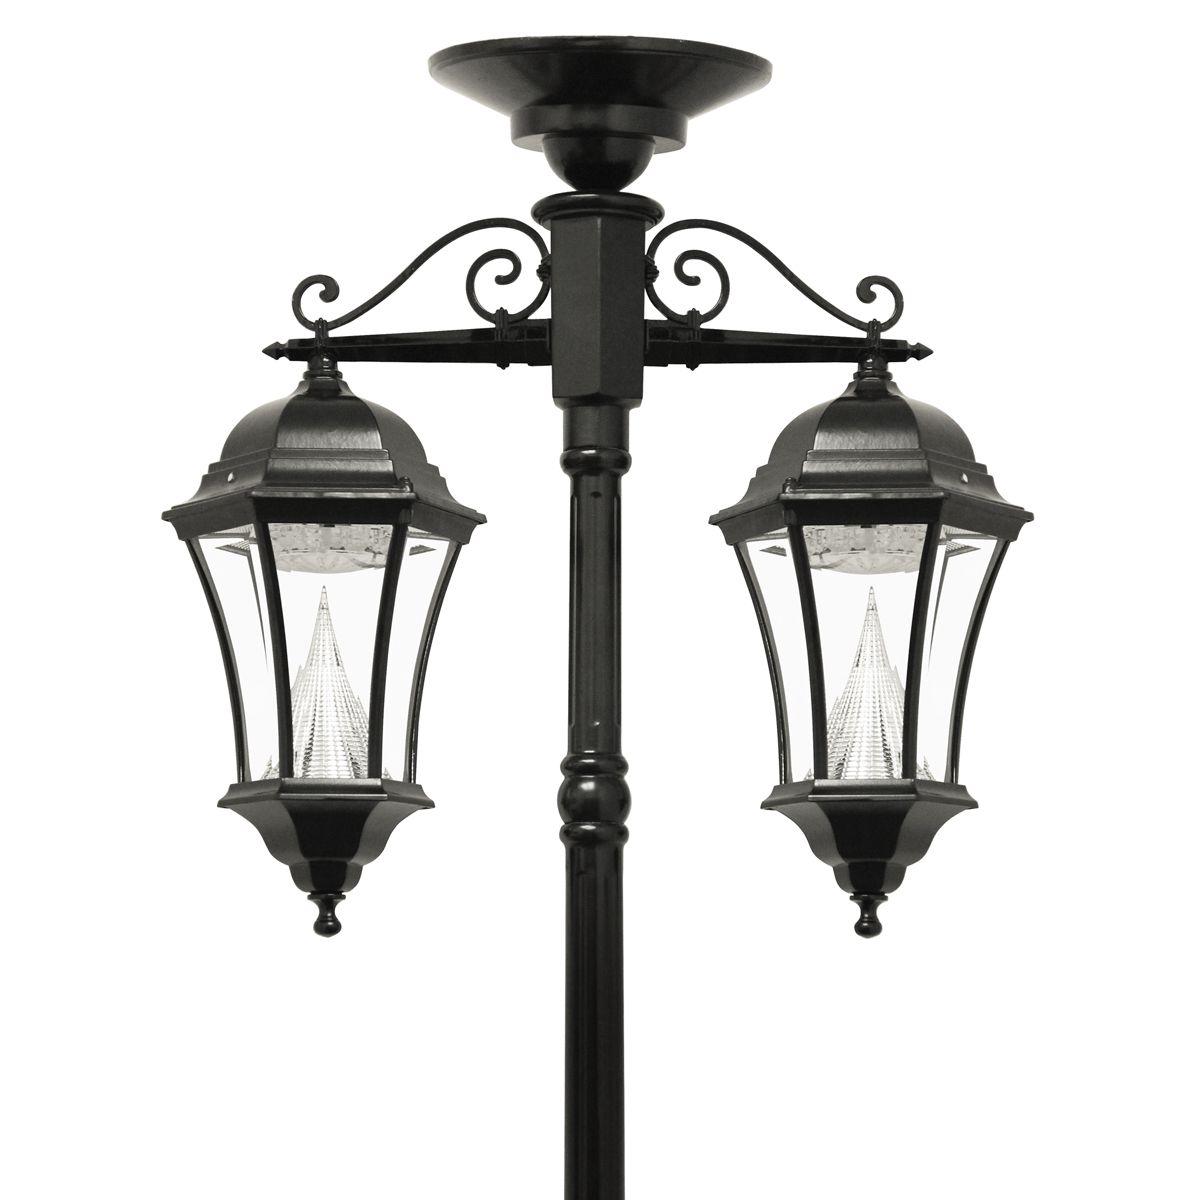 Victorian Solar Lamp Series Double Downward Hanging Lamp Post Gs 94c D Solarleuchten Lampen Aussenleuchten